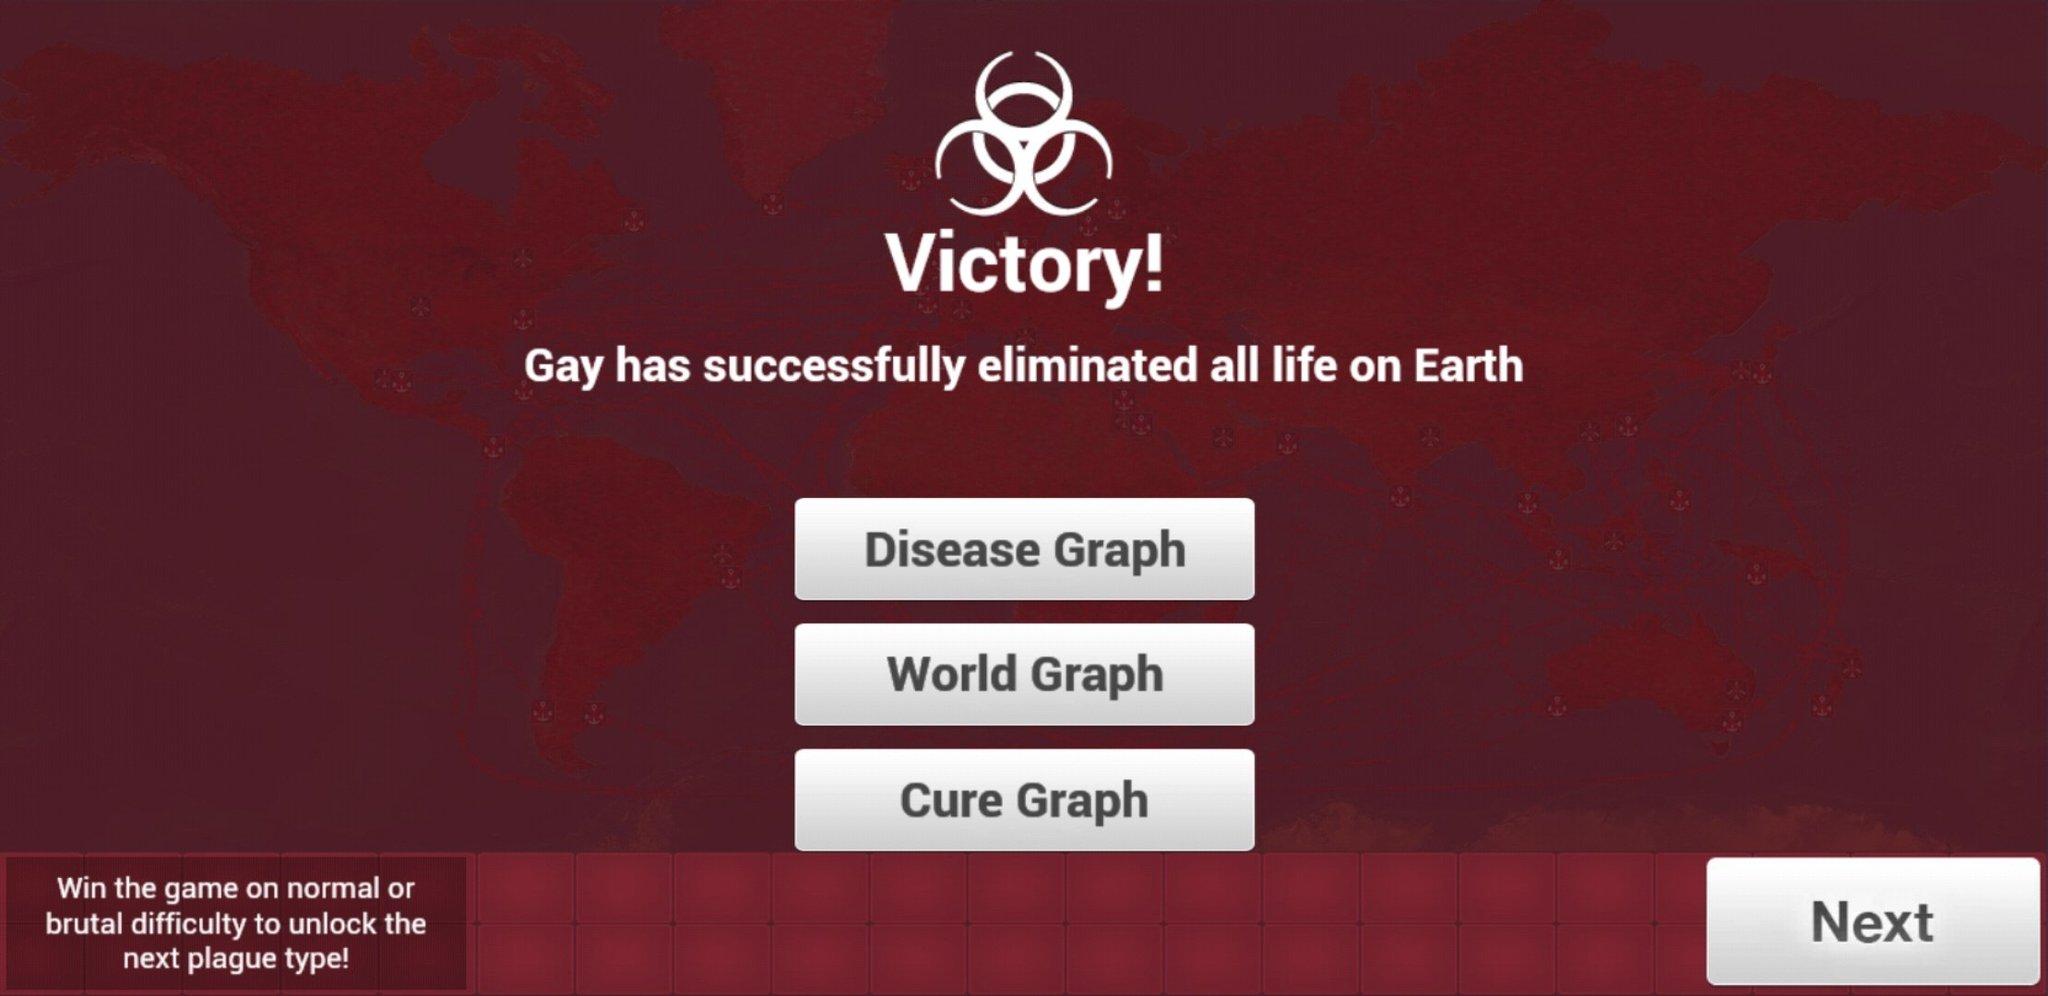 The gaye has been eradicated - meme